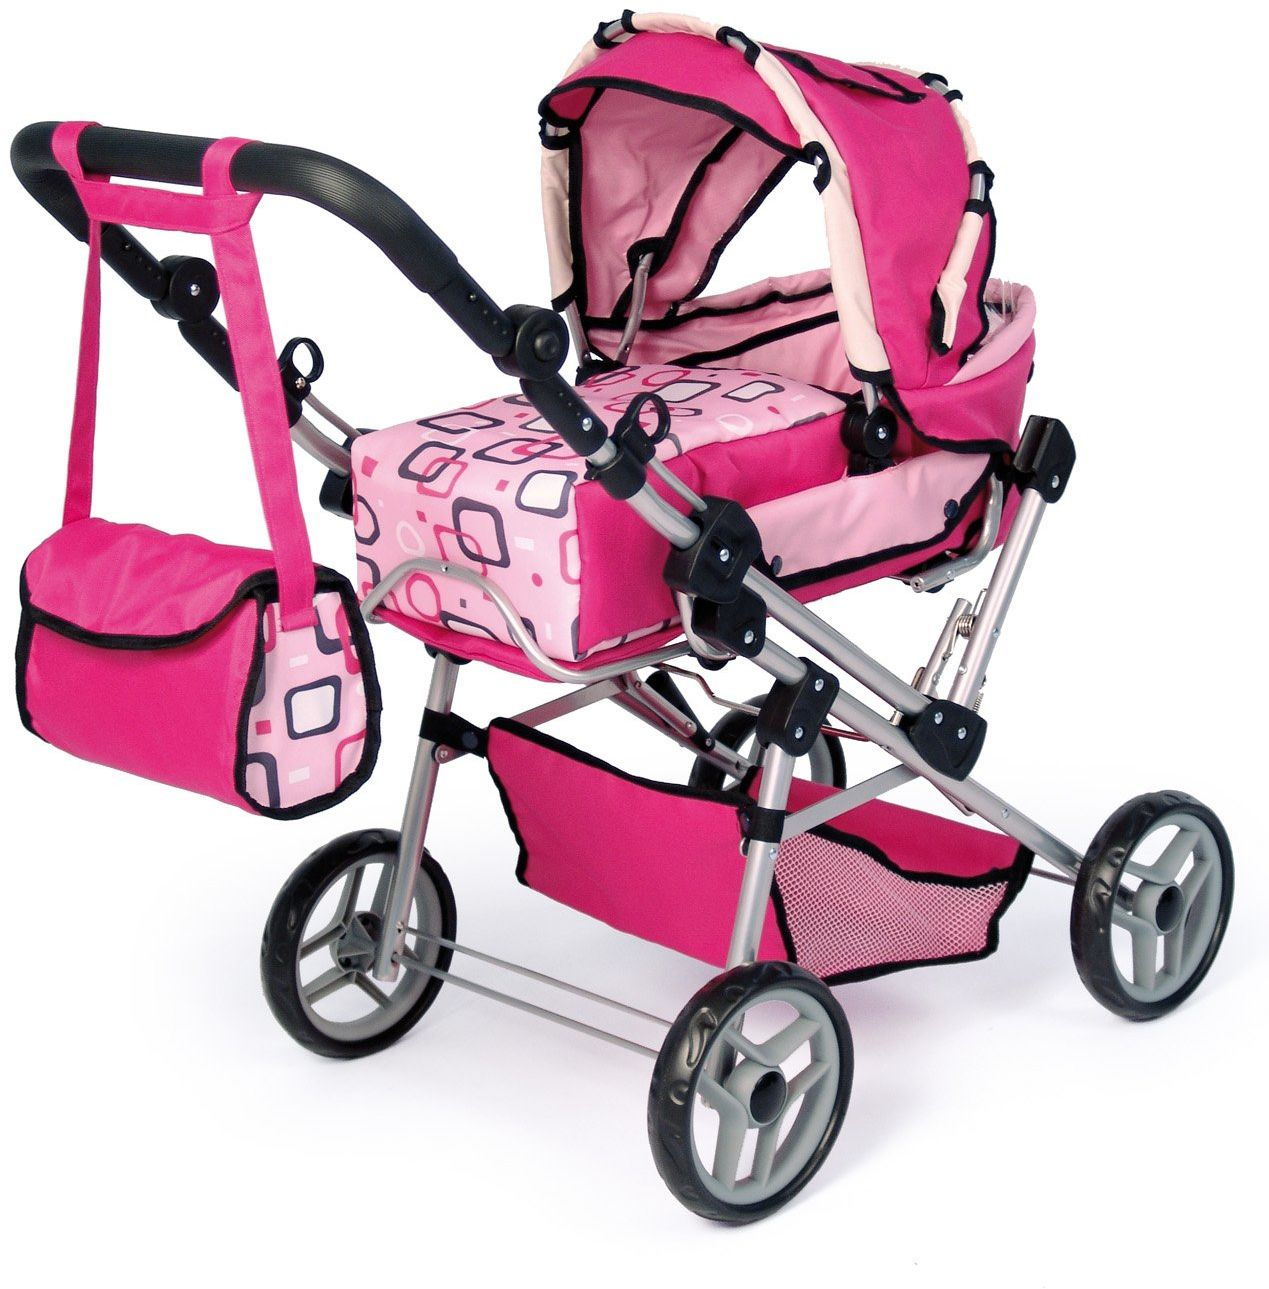 Bayer Design 19197 - wózek dla lalek Trendsetter różowy